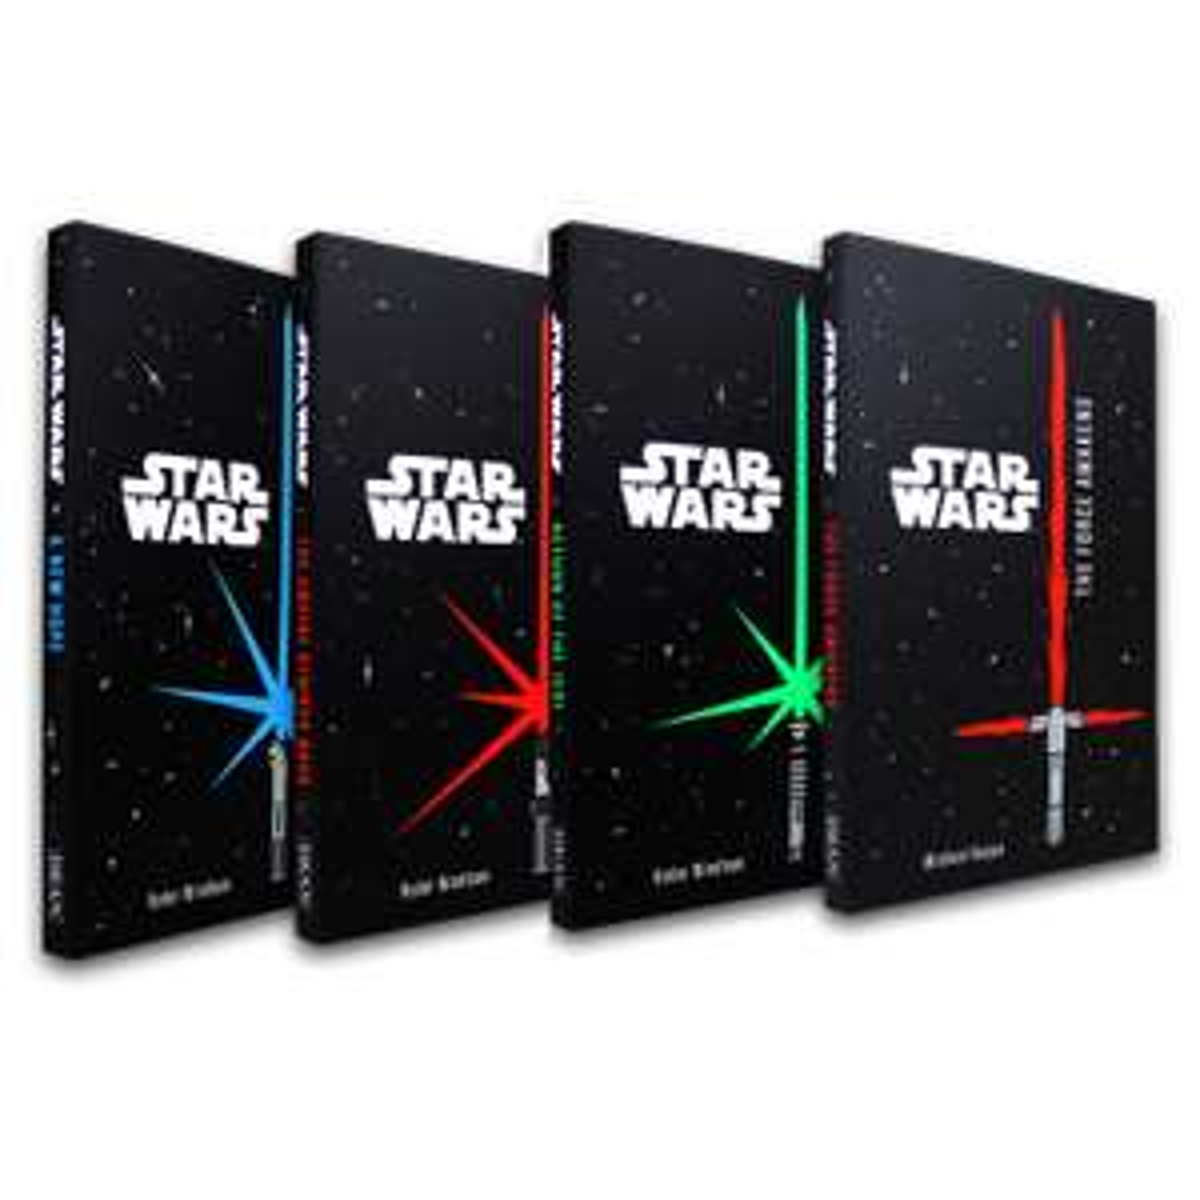 Star Wars 4 Books Set Junior Novel Collection by Lucas Films & Ryder Windham £3.50 @ Books2Door (£2.49 P&P)